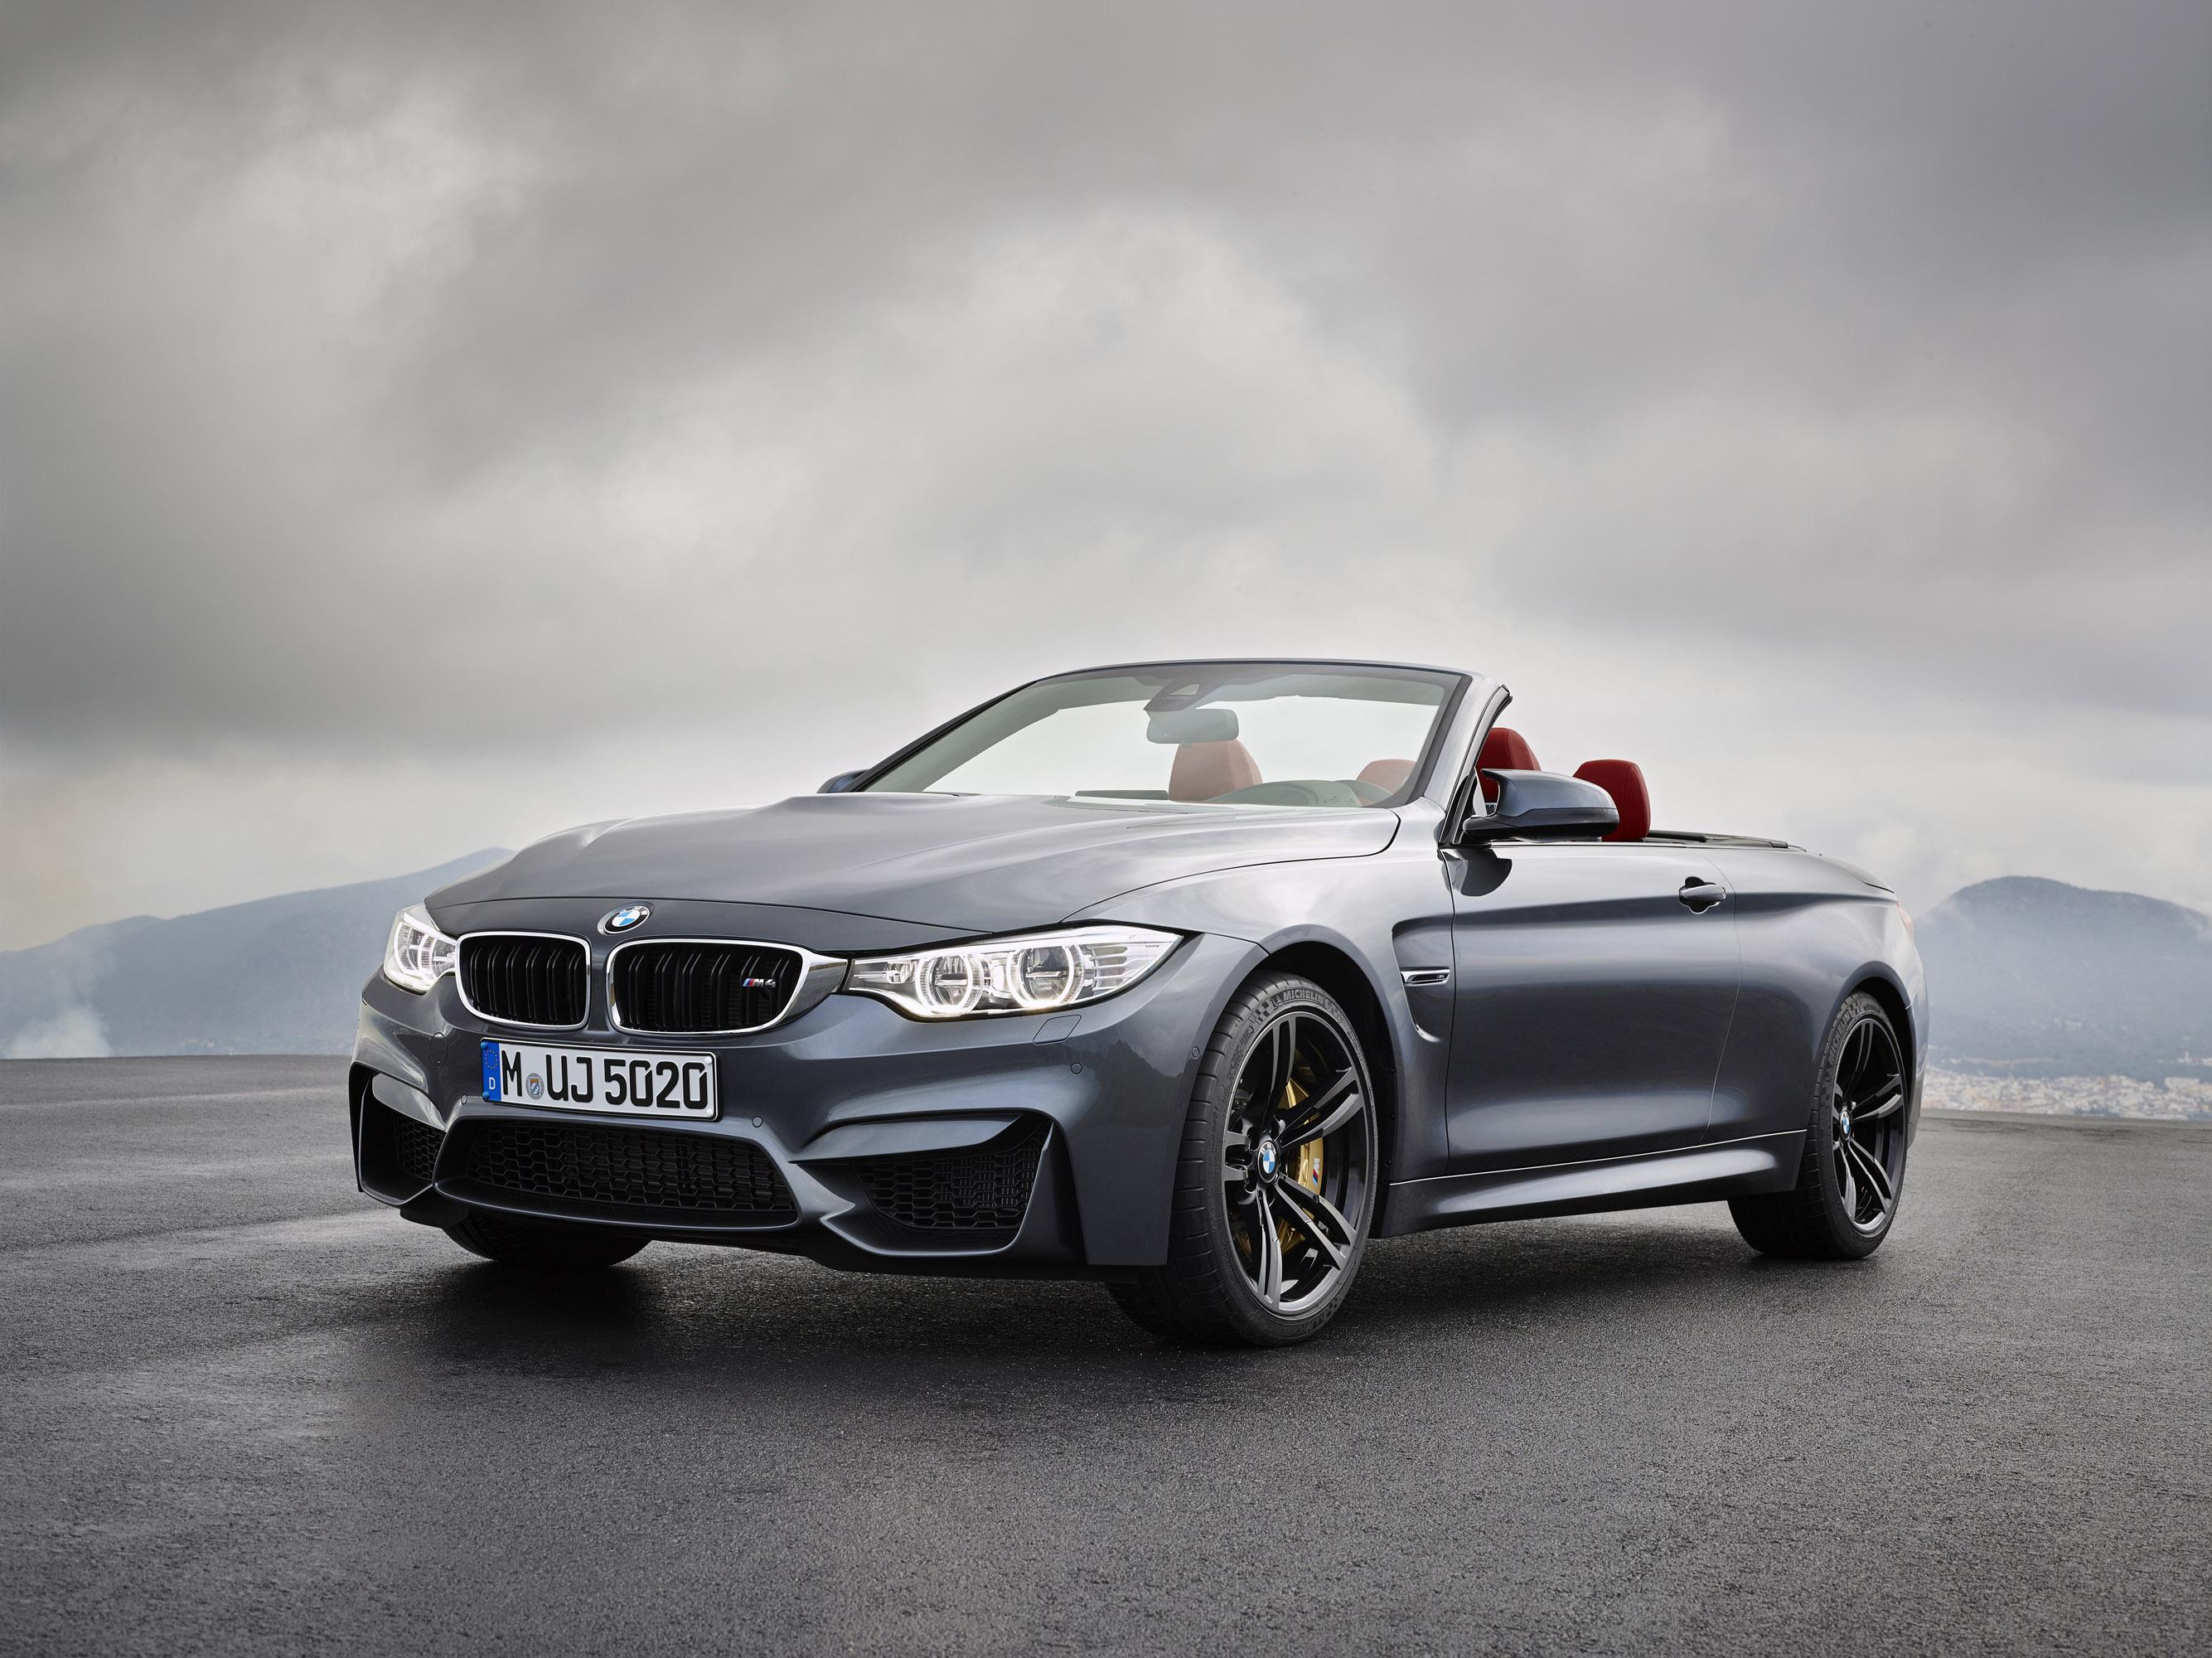 BMW M4 Convertible photo #1